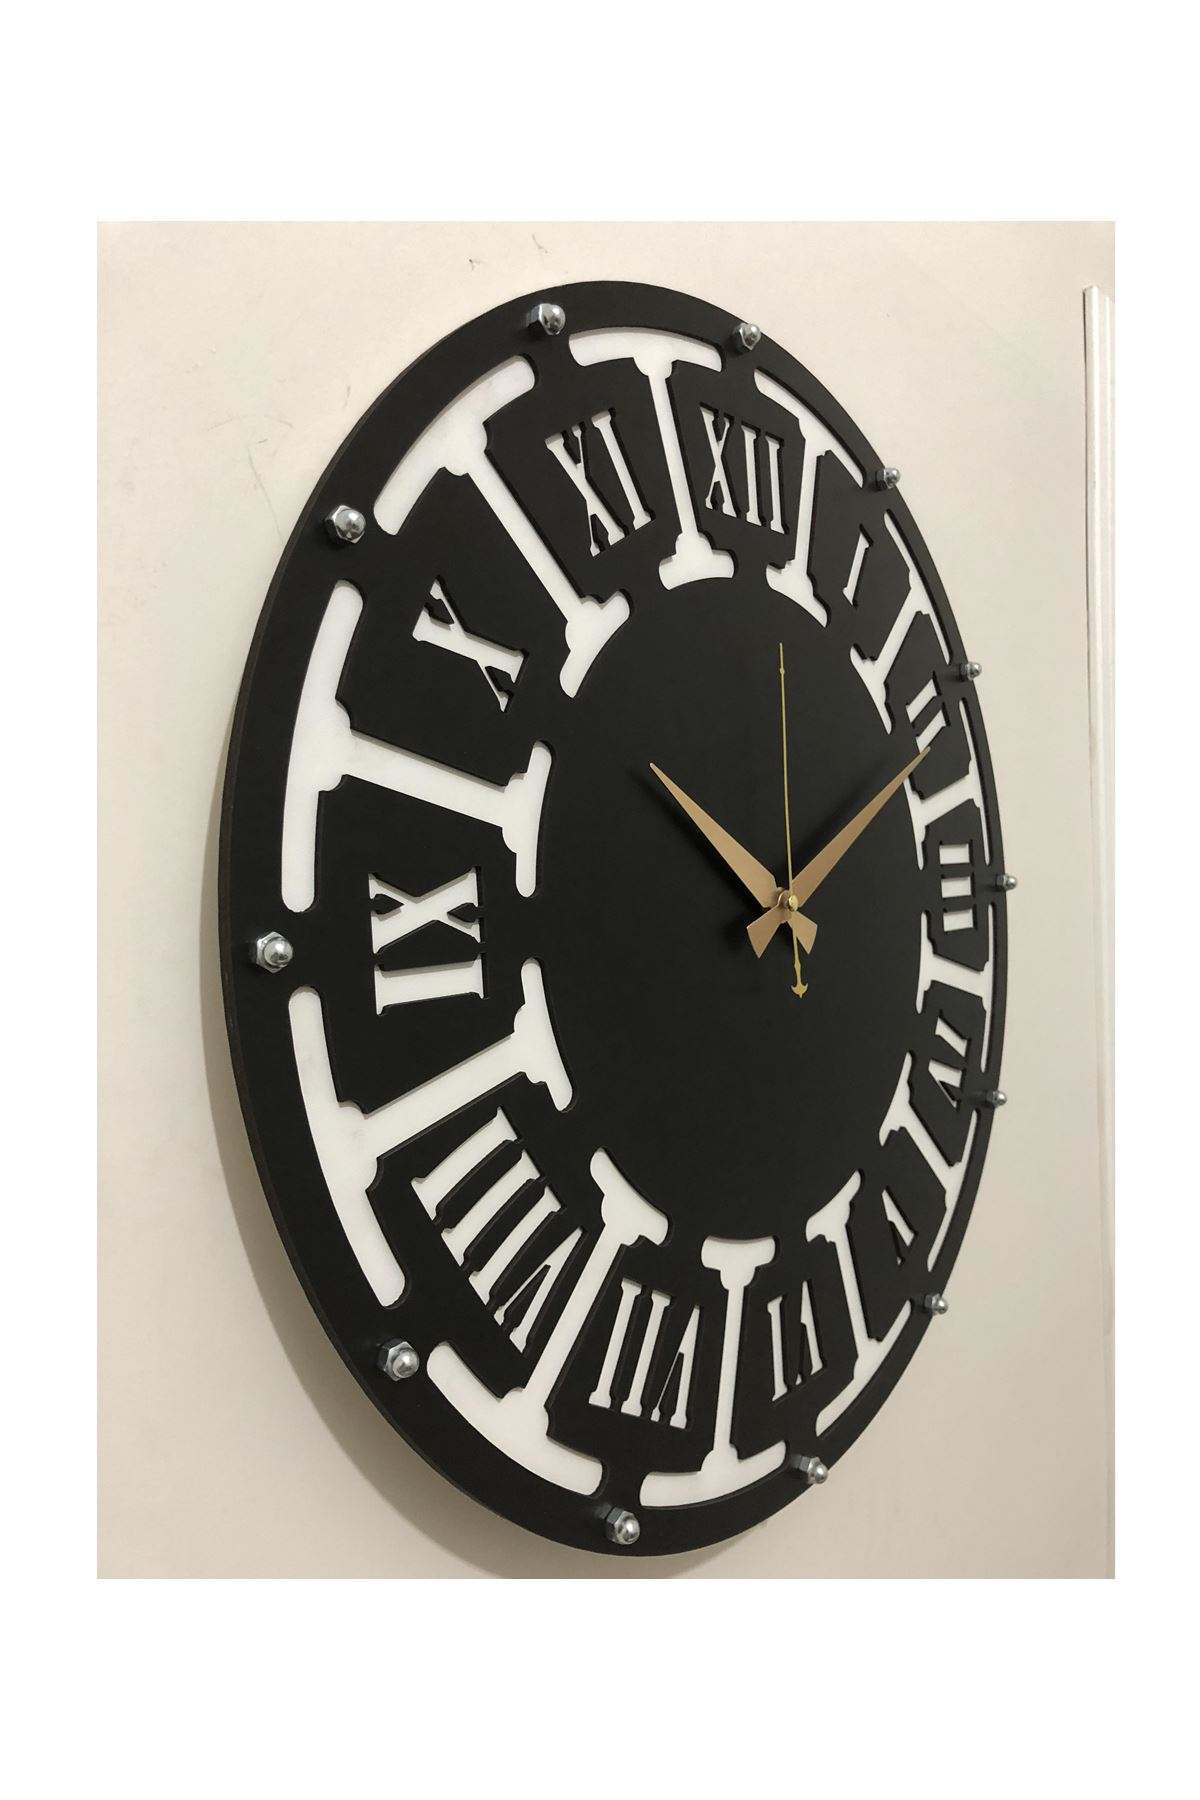 Rikon Ahşap Roma Rakamlı Black Dekorati Duvar Saati  50X50 Cm